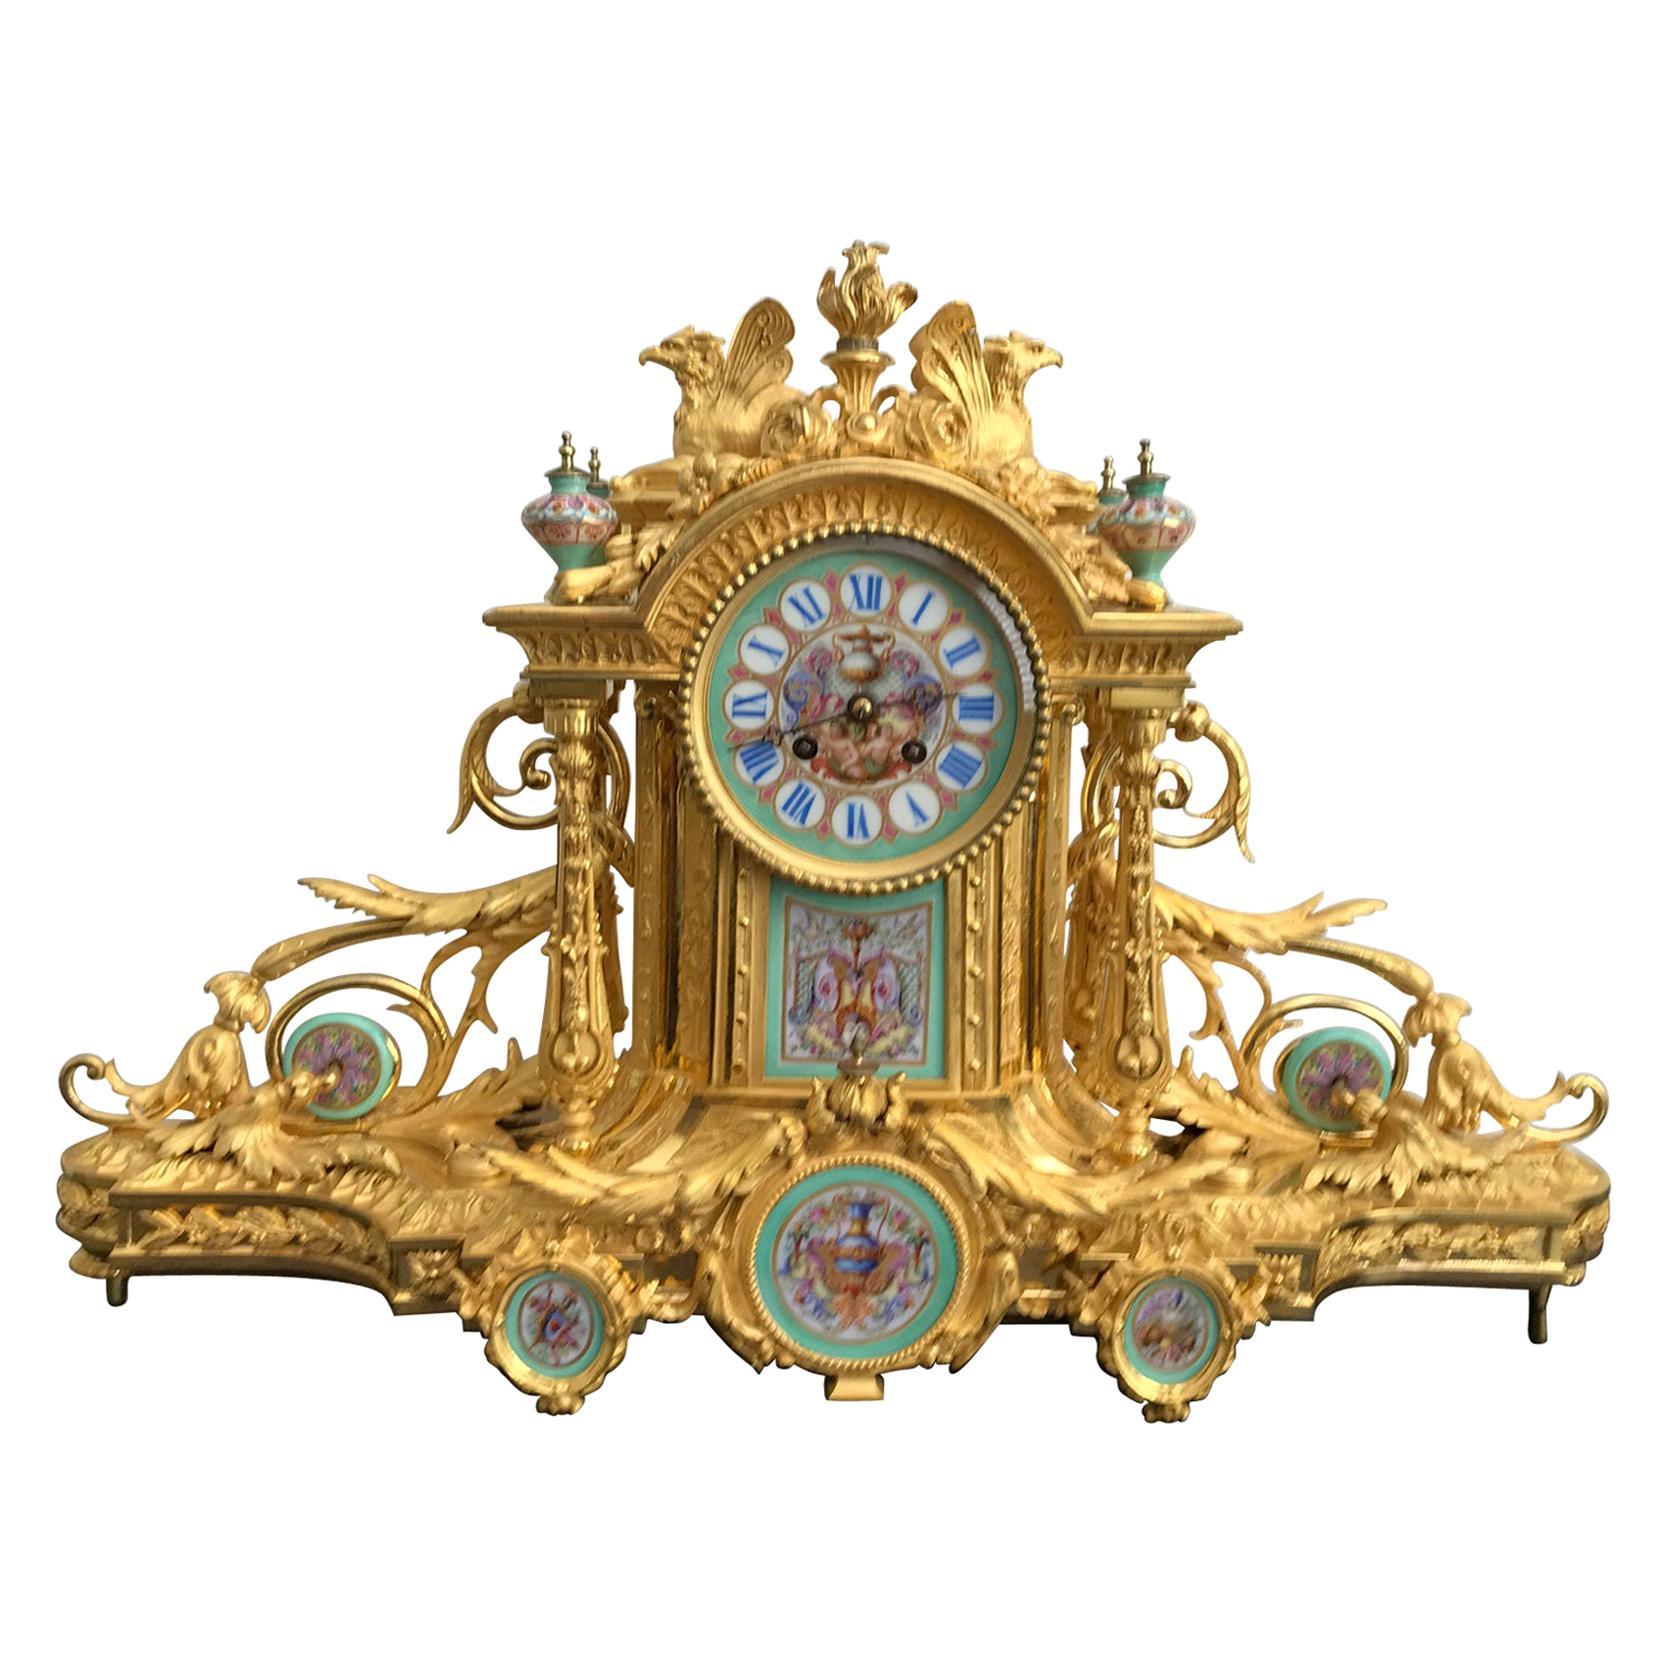 Napoleon III Sèvres Porcelain Mounted Gilt Bronze Mantel Clock, circa 1870